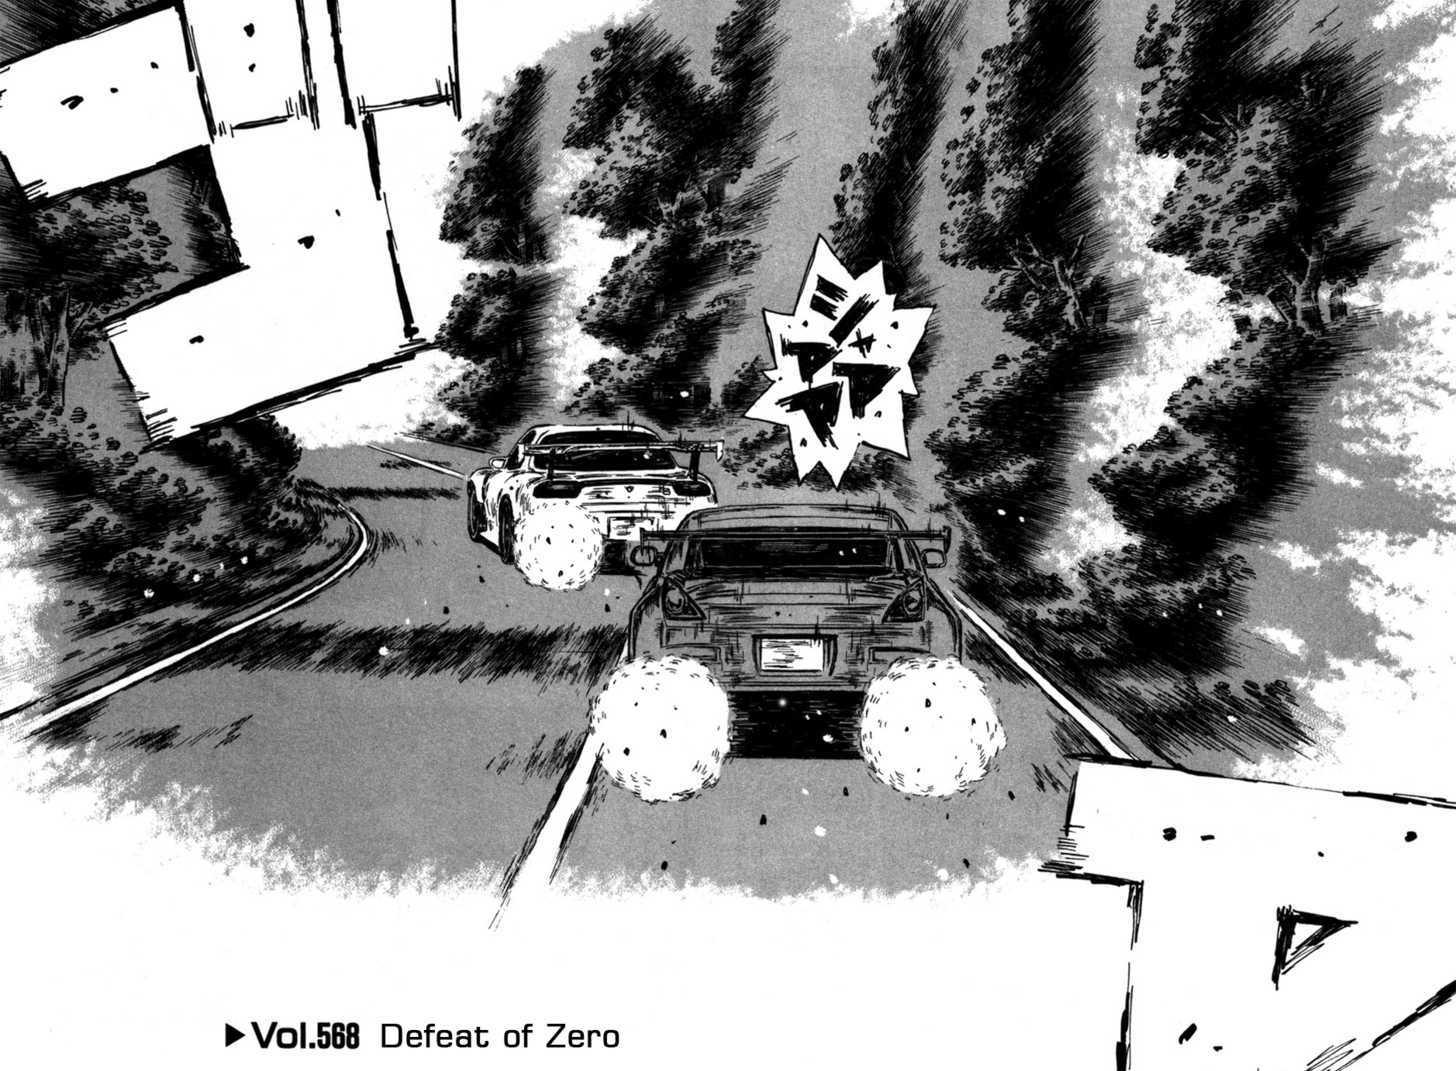 https://im.nineanime.com/comics/pic9/61/2493/61244/InitialD5680623.jpg Page 1